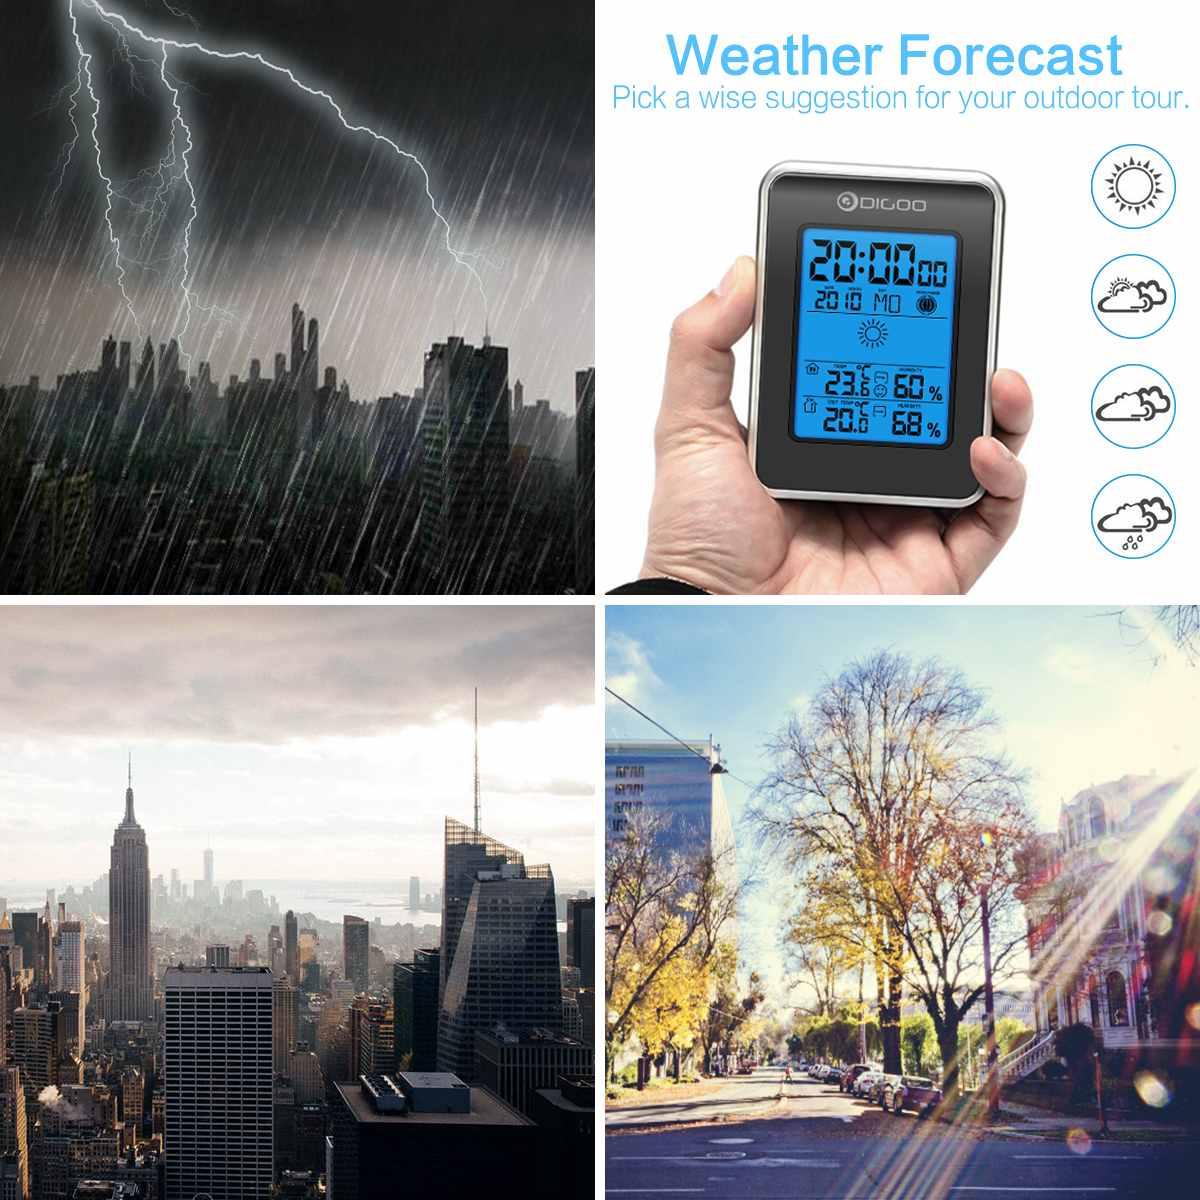 Digoo DG TH1981 LCD Digital Weather Station Wireless Outdoor Forecast Sensor Hygrometer Thermometer Clock Blue Backlit Digoo DG-TH1981 LCD Digital Weather Station + Wireless Outdoor Forecast Sensor Hygrometer Thermometer Clock Blue Backlit